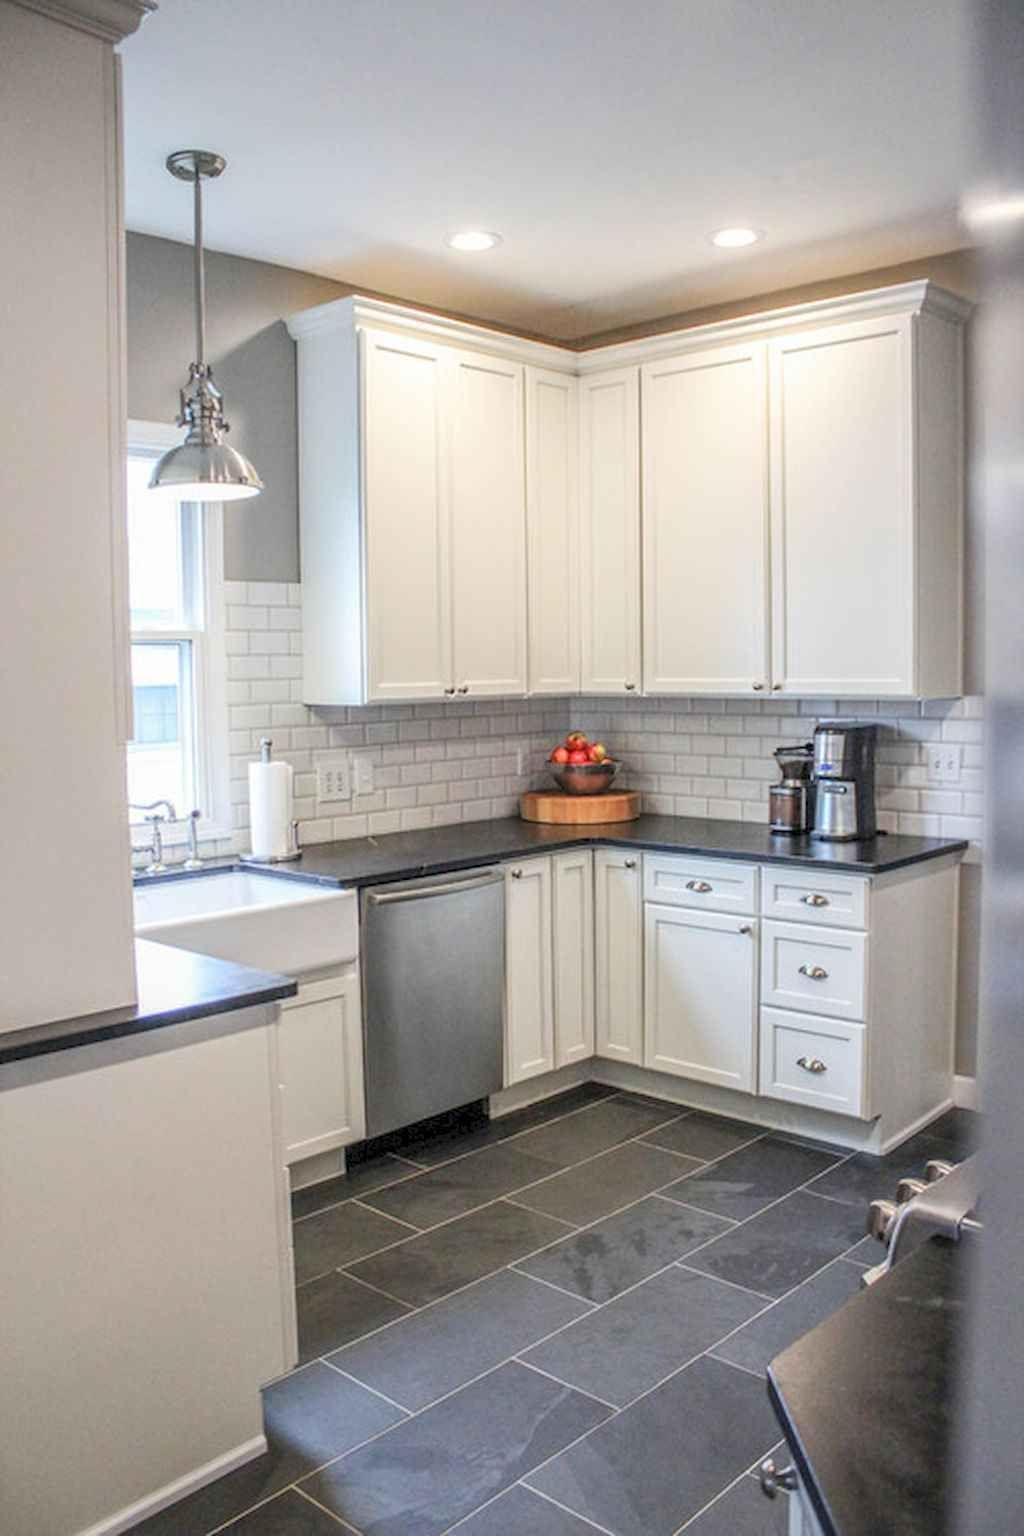 Kitchen Floor Mats Comfort And Ergonomic Type Of Mats In 2020 Kitchen Mats Floor Kitchen Flooring Modern Kitchen Flooring